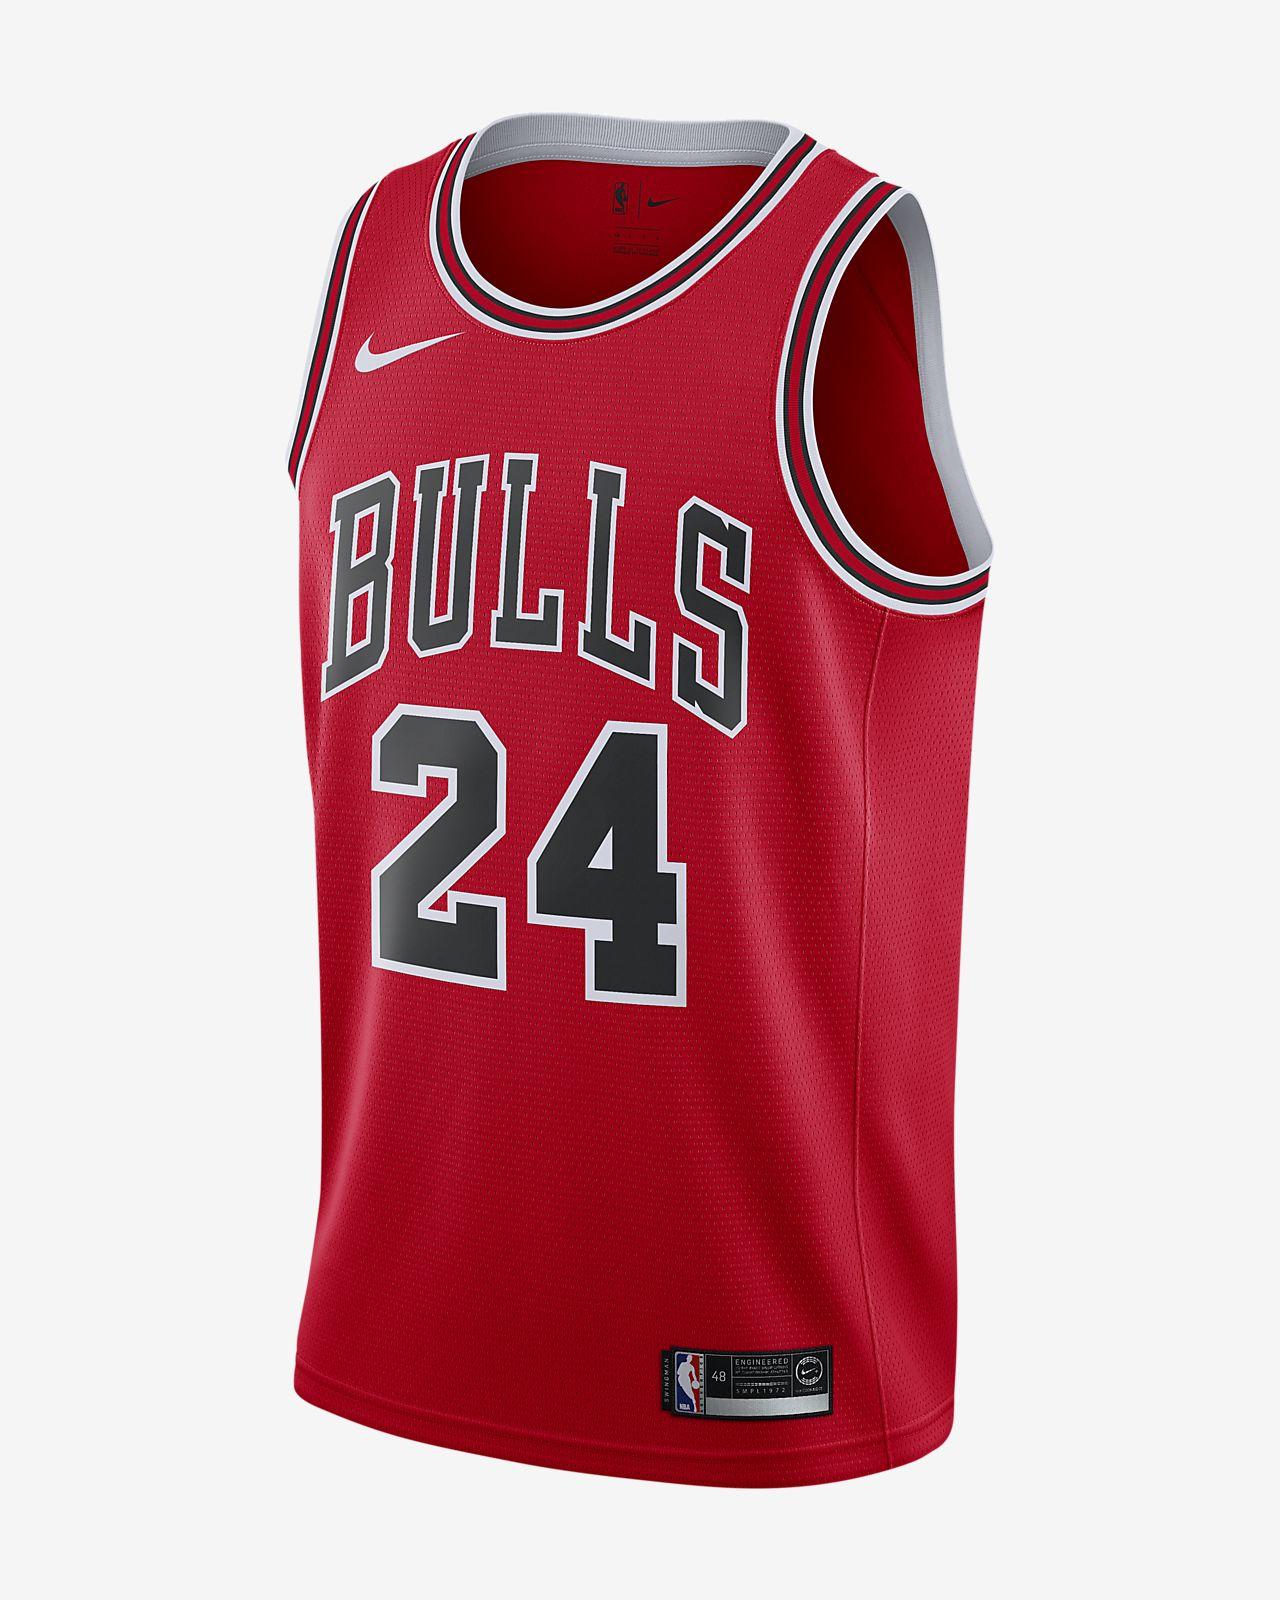 Pánský dres Nike NBA Connected Lauri Markkanen Icon Edition Swingman (Chicago Bulls)